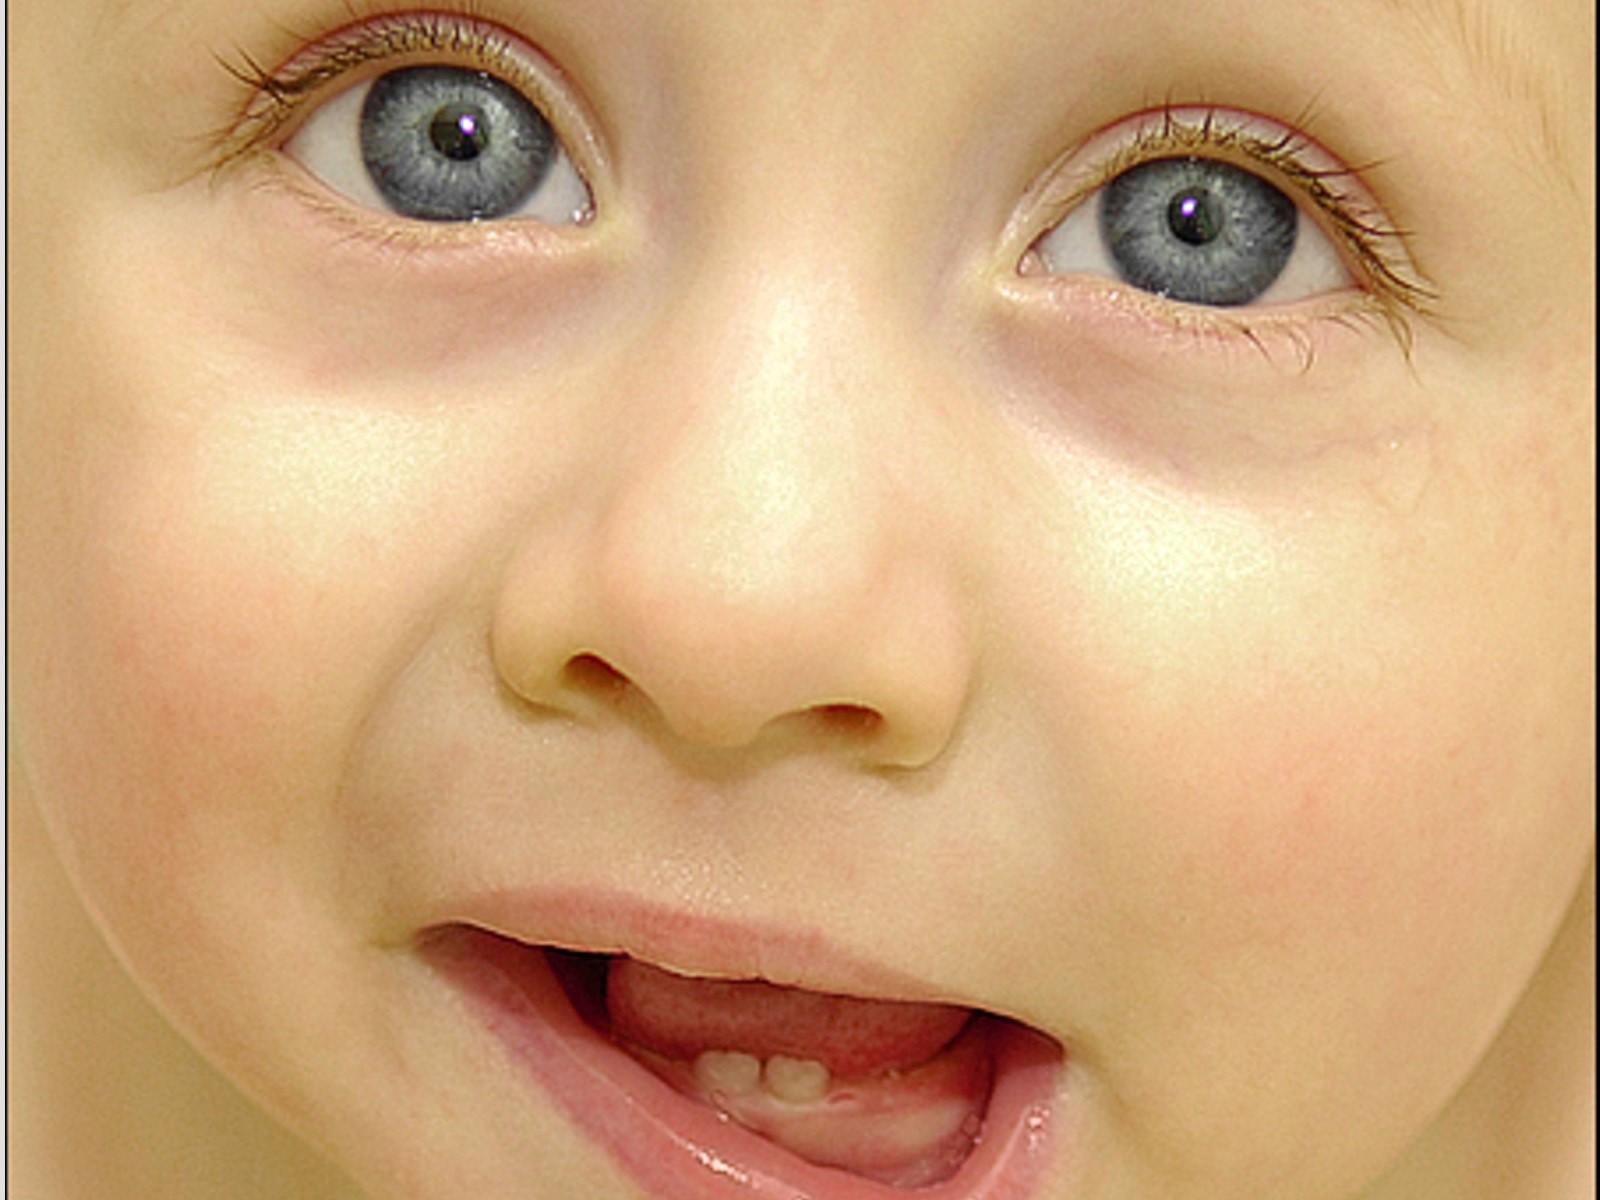 Cute Baby Child Closeup Pic & Image